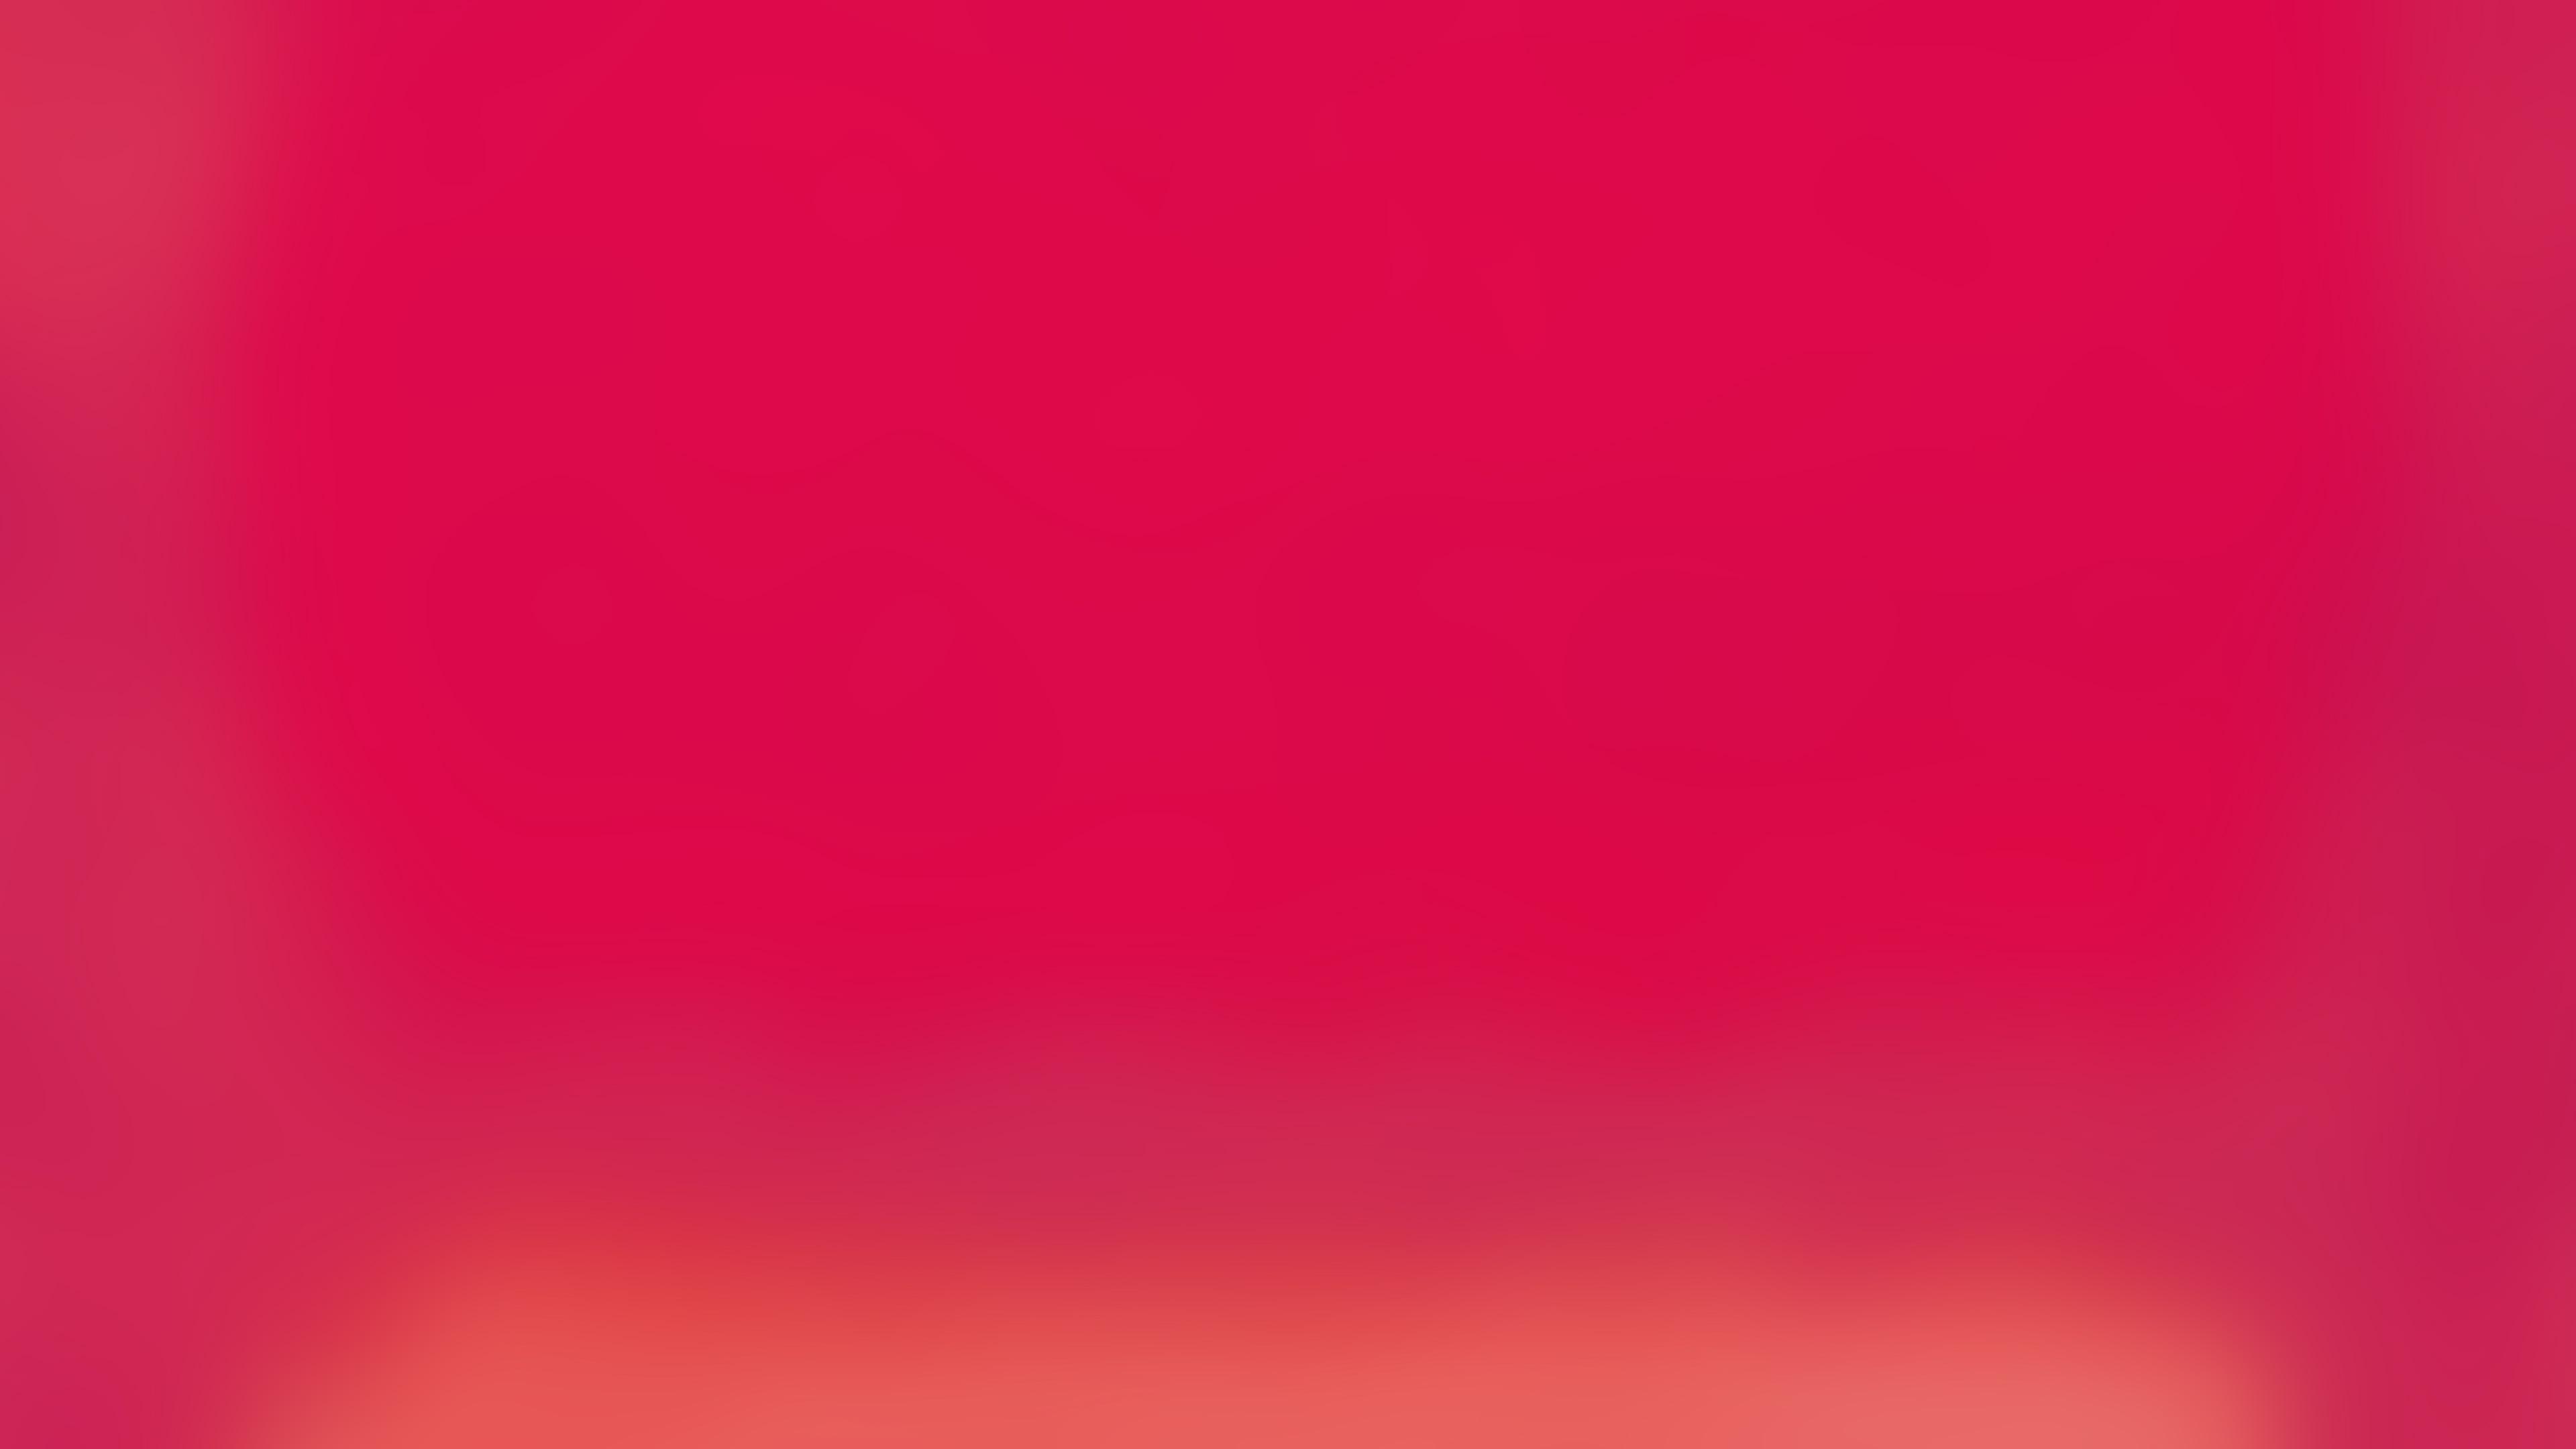 Ariana Grande Wallpaper Iphone 6 3840 X 2400